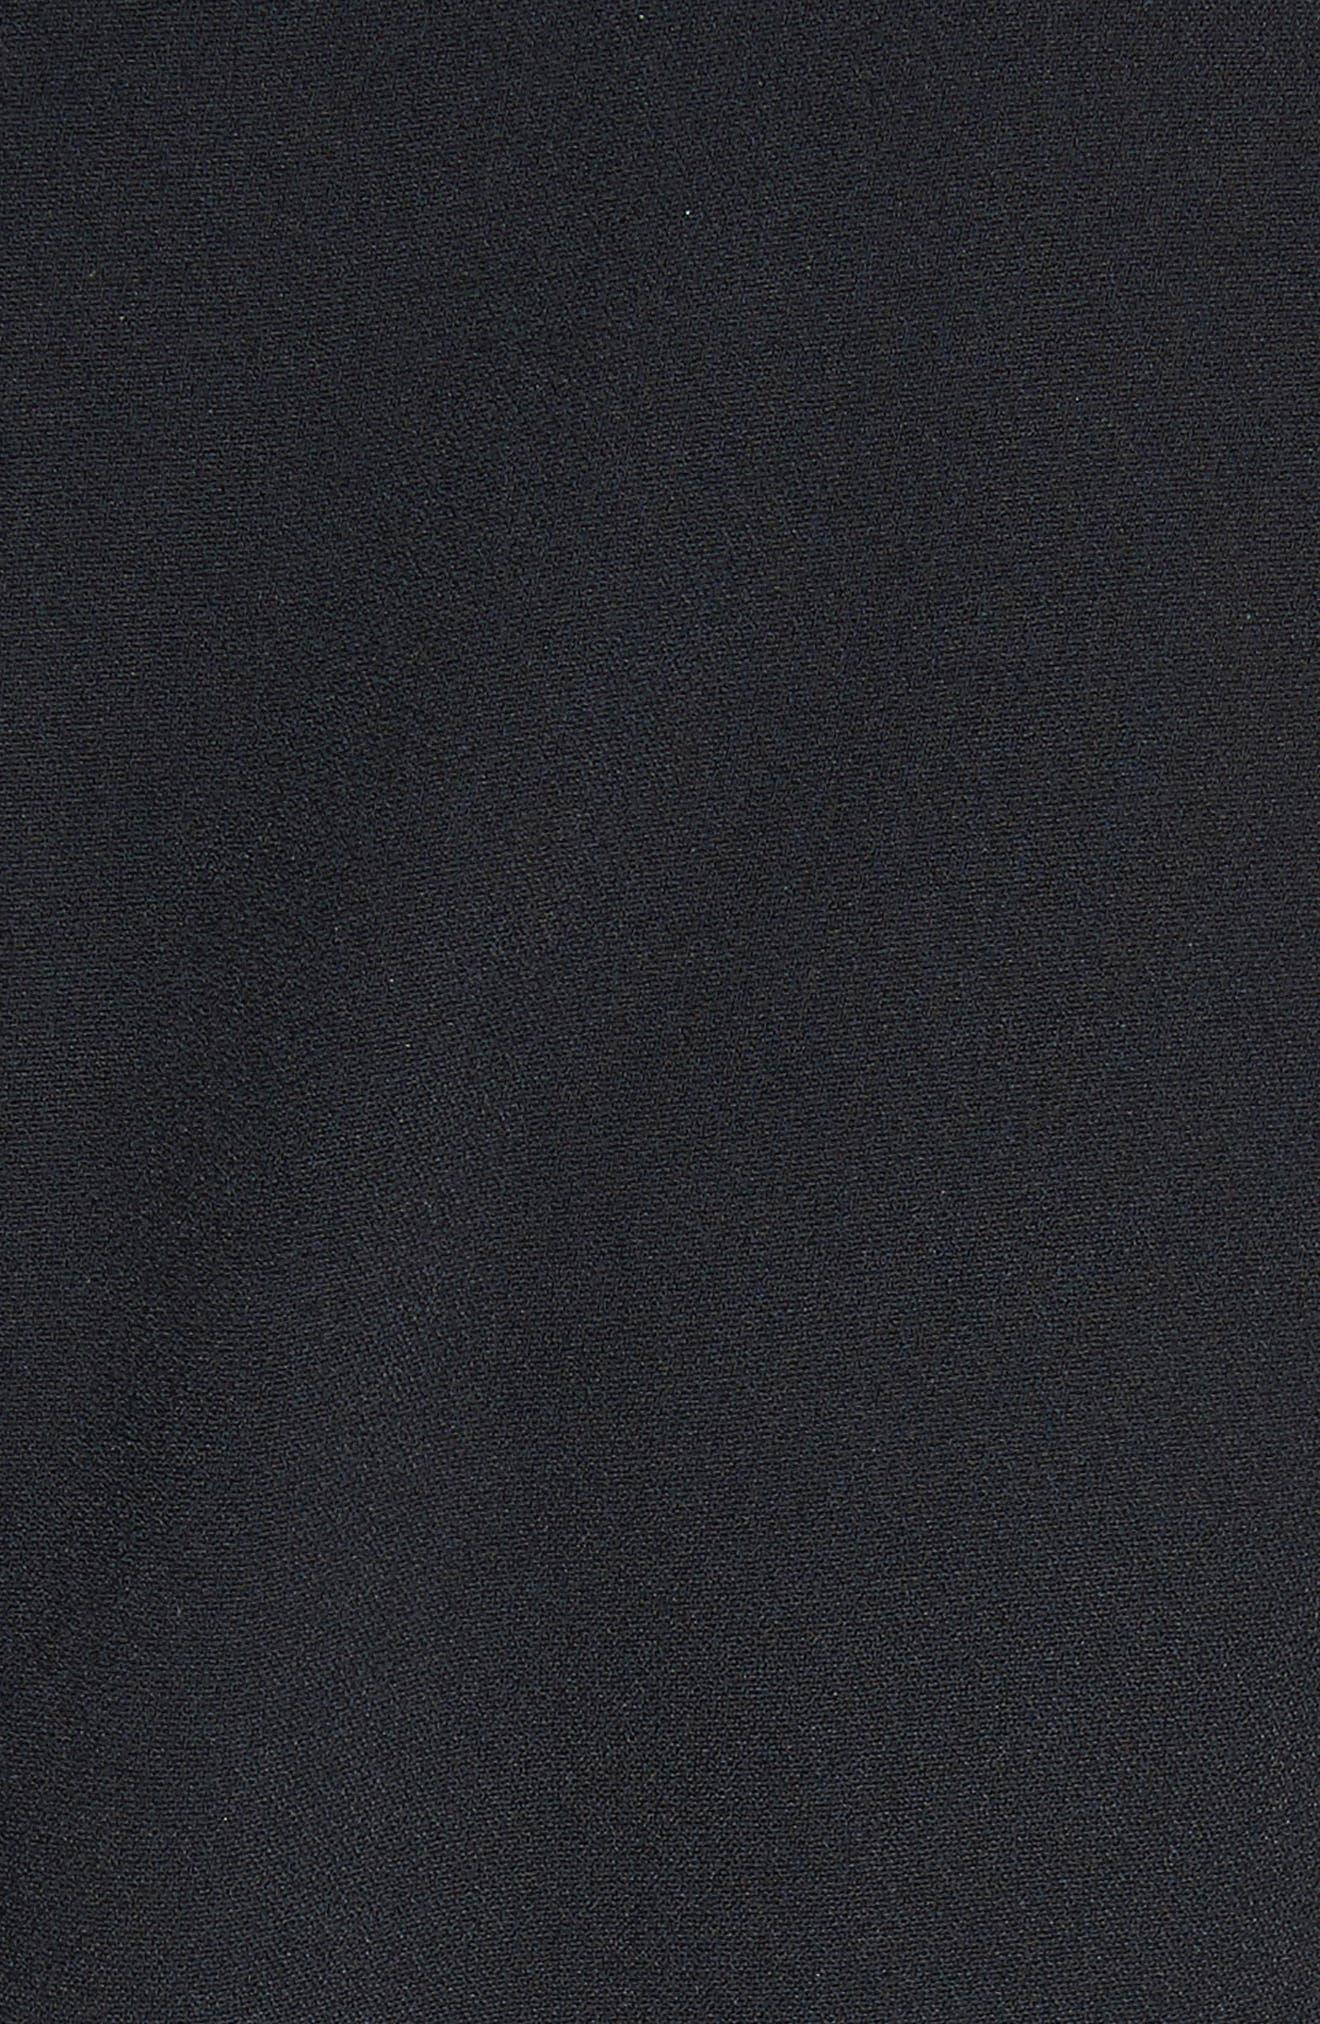 Velvet Trim Cady Turtleneck Dress,                             Alternate thumbnail 5, color,                             001